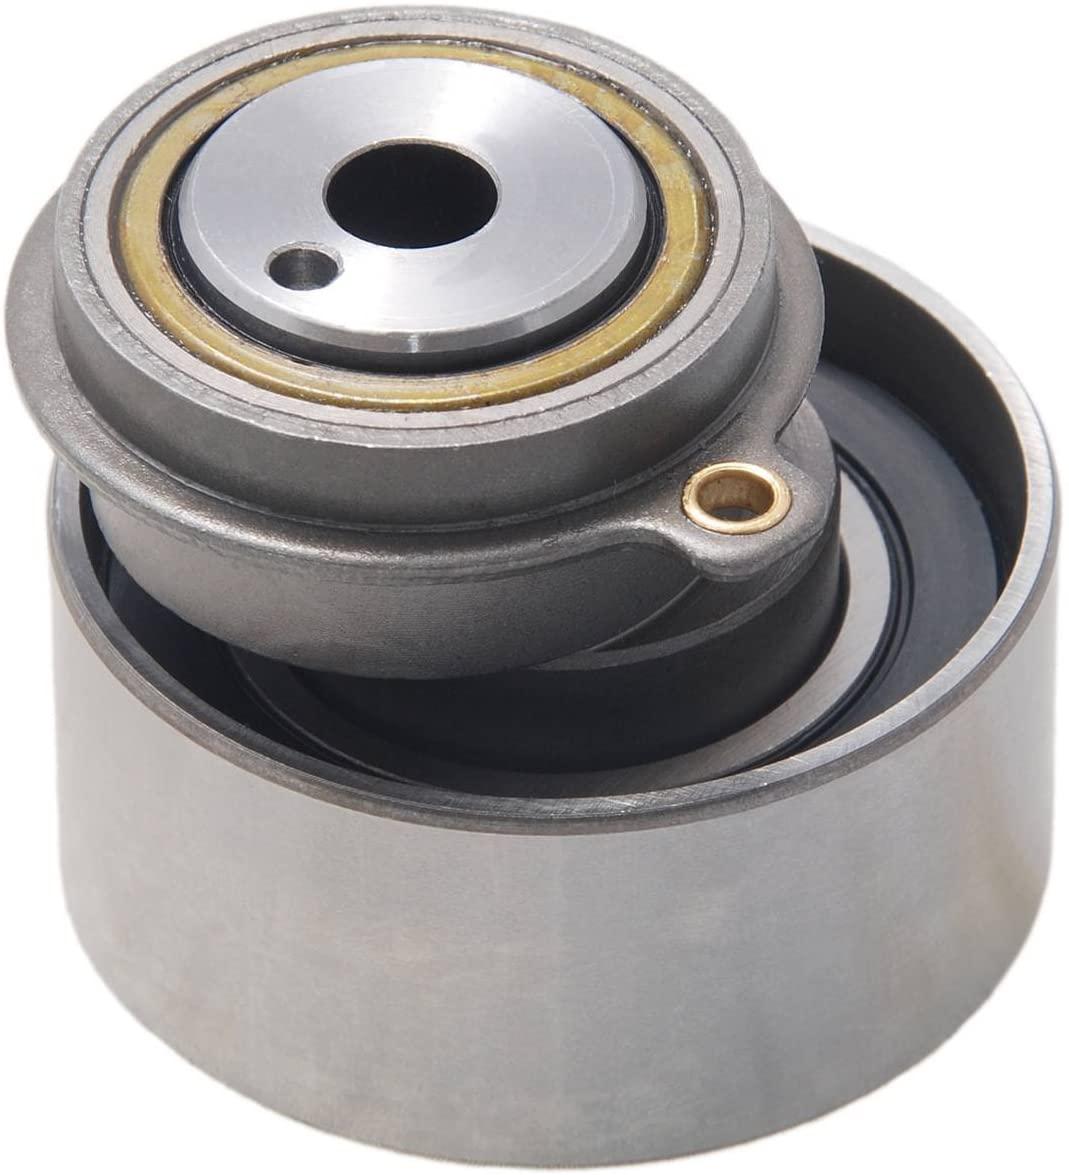 Fs05-12-700 / Fs0512700 - Pulley Idler For Mazda